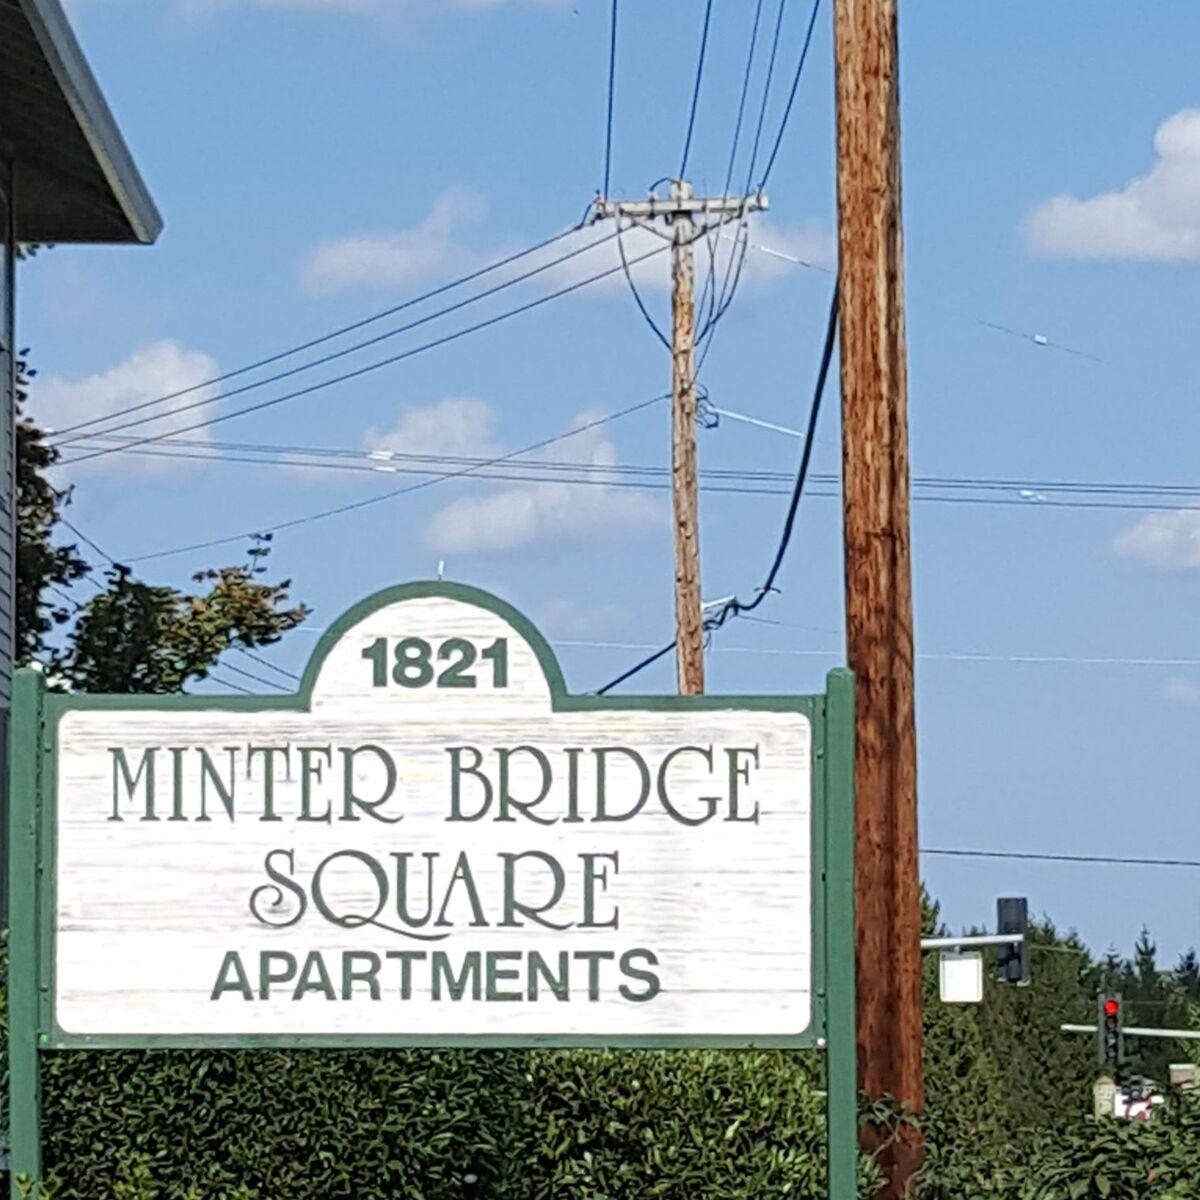 Hillsboro Apartments: Apartments For Rent In Hillsboro, OR